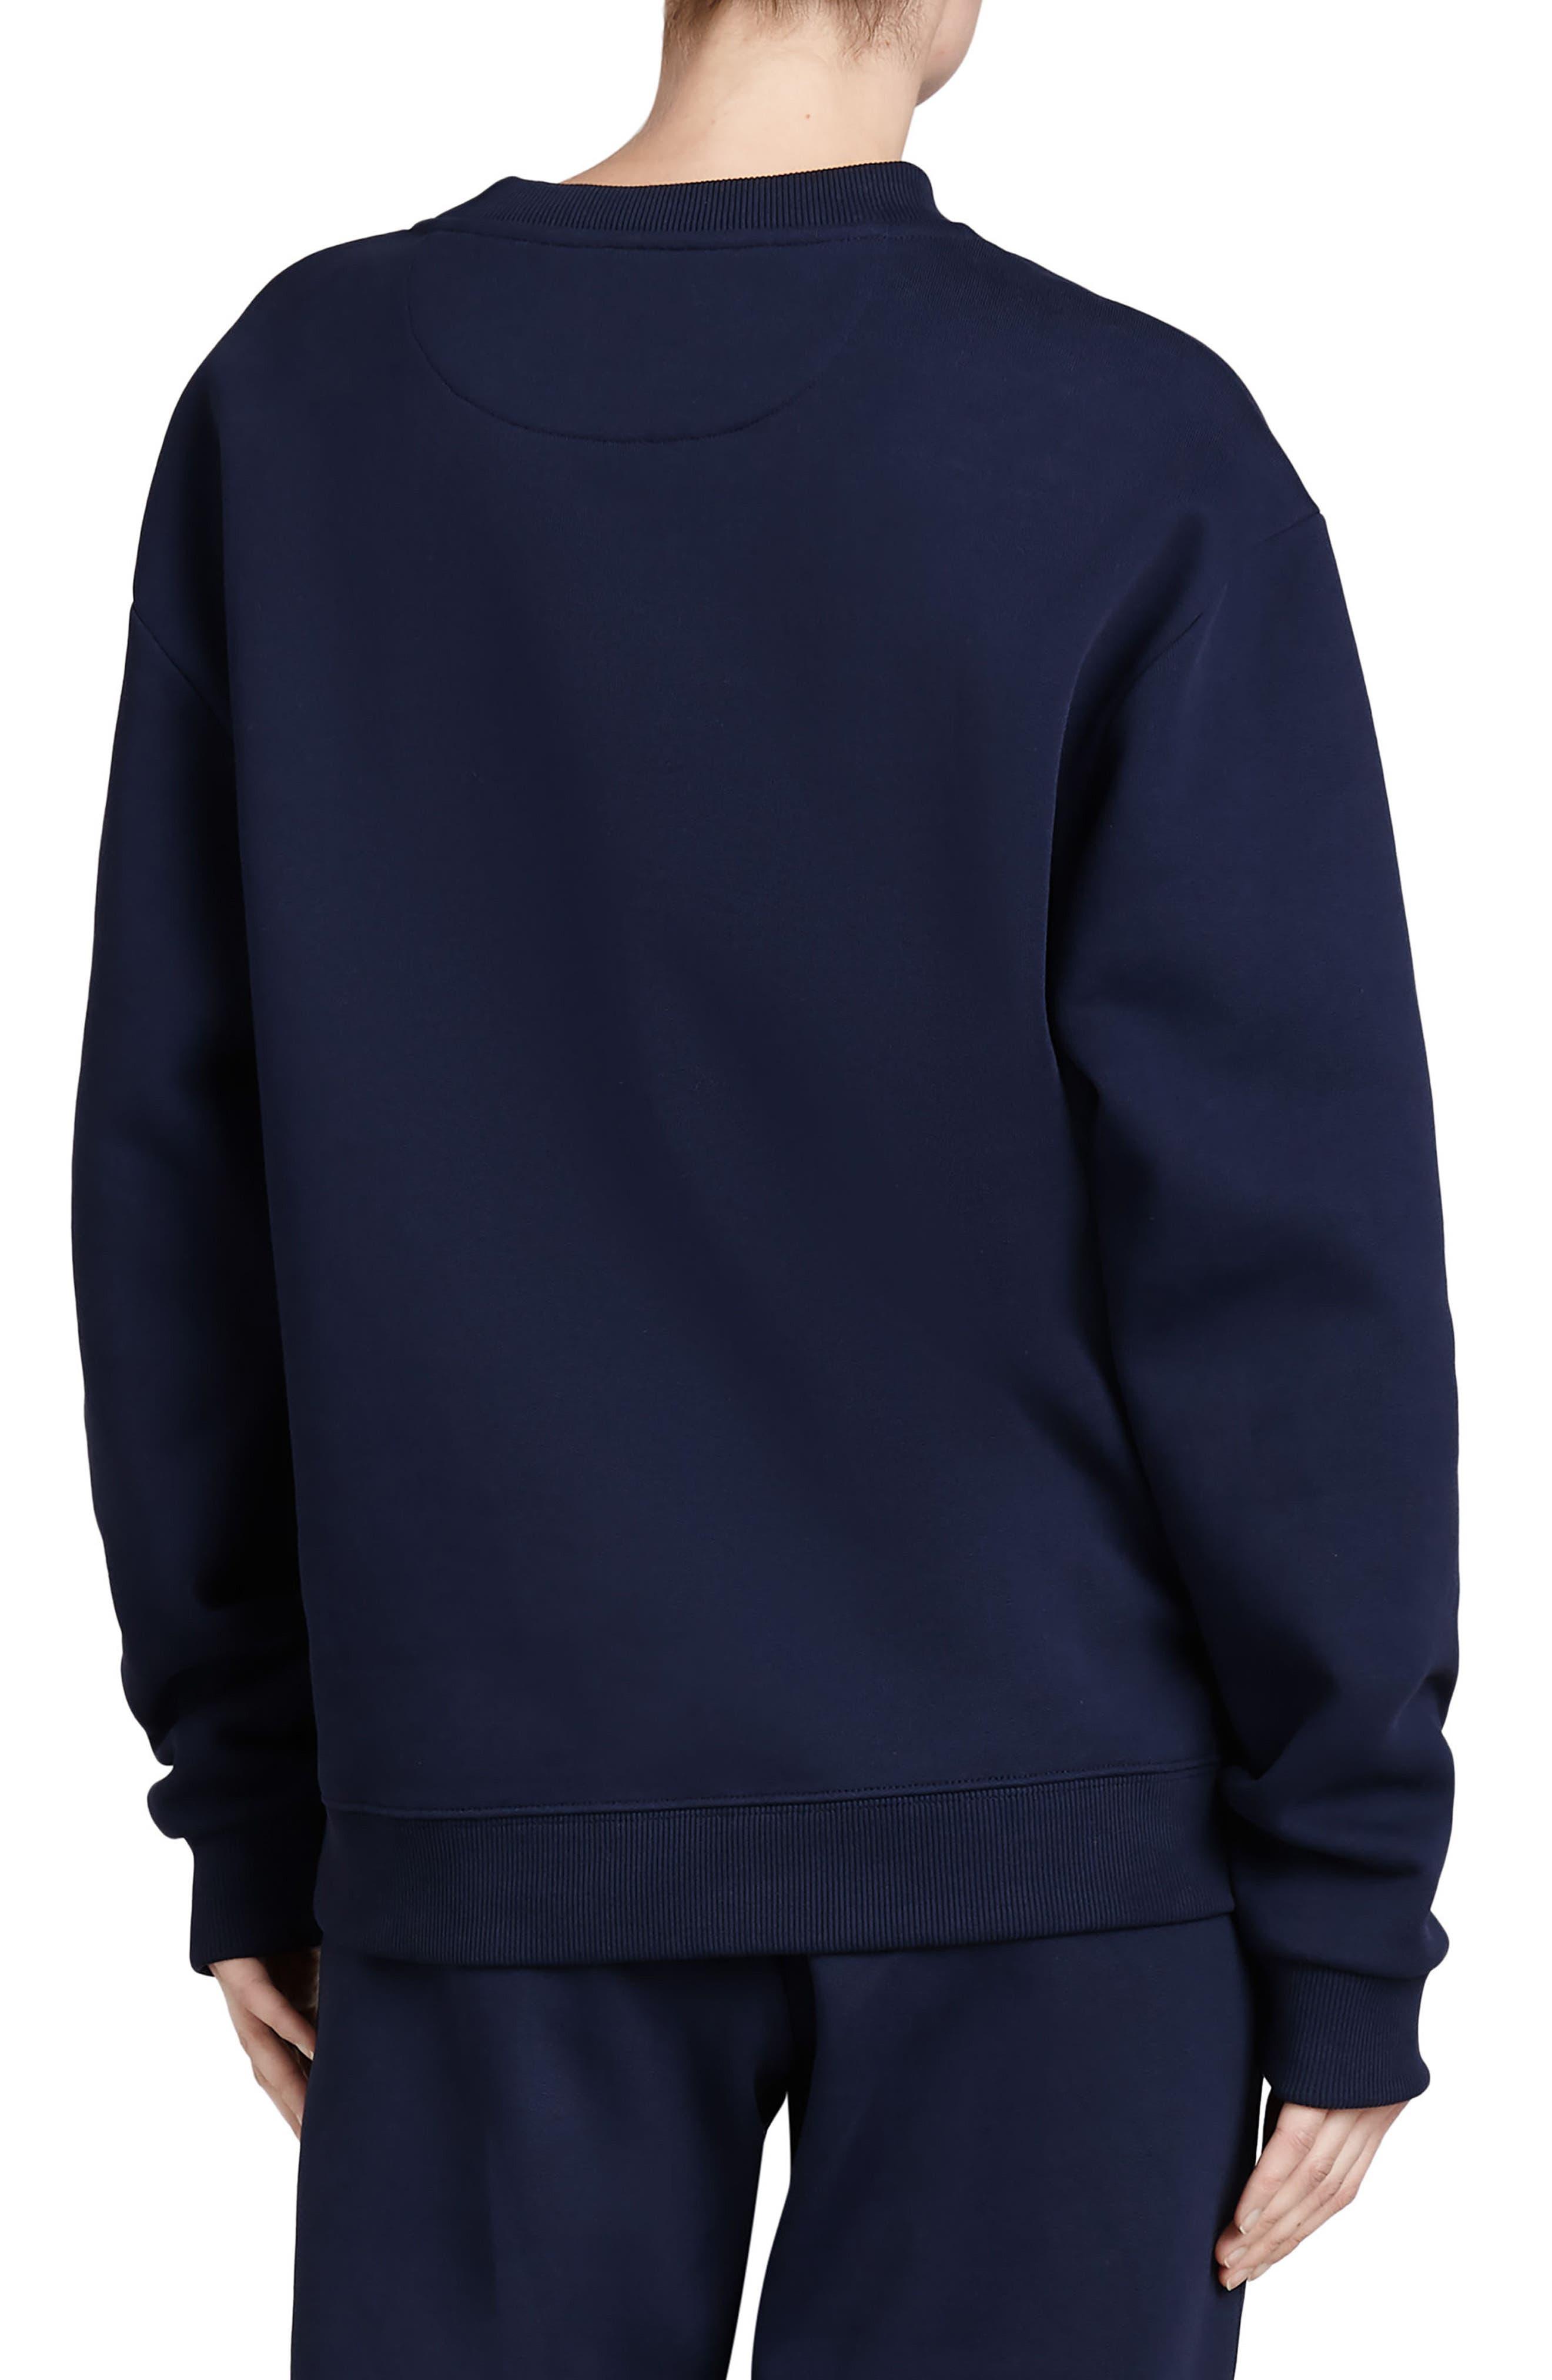 Vintage Crest Sweatshirt,                             Alternate thumbnail 2, color,                             Midnight Blue